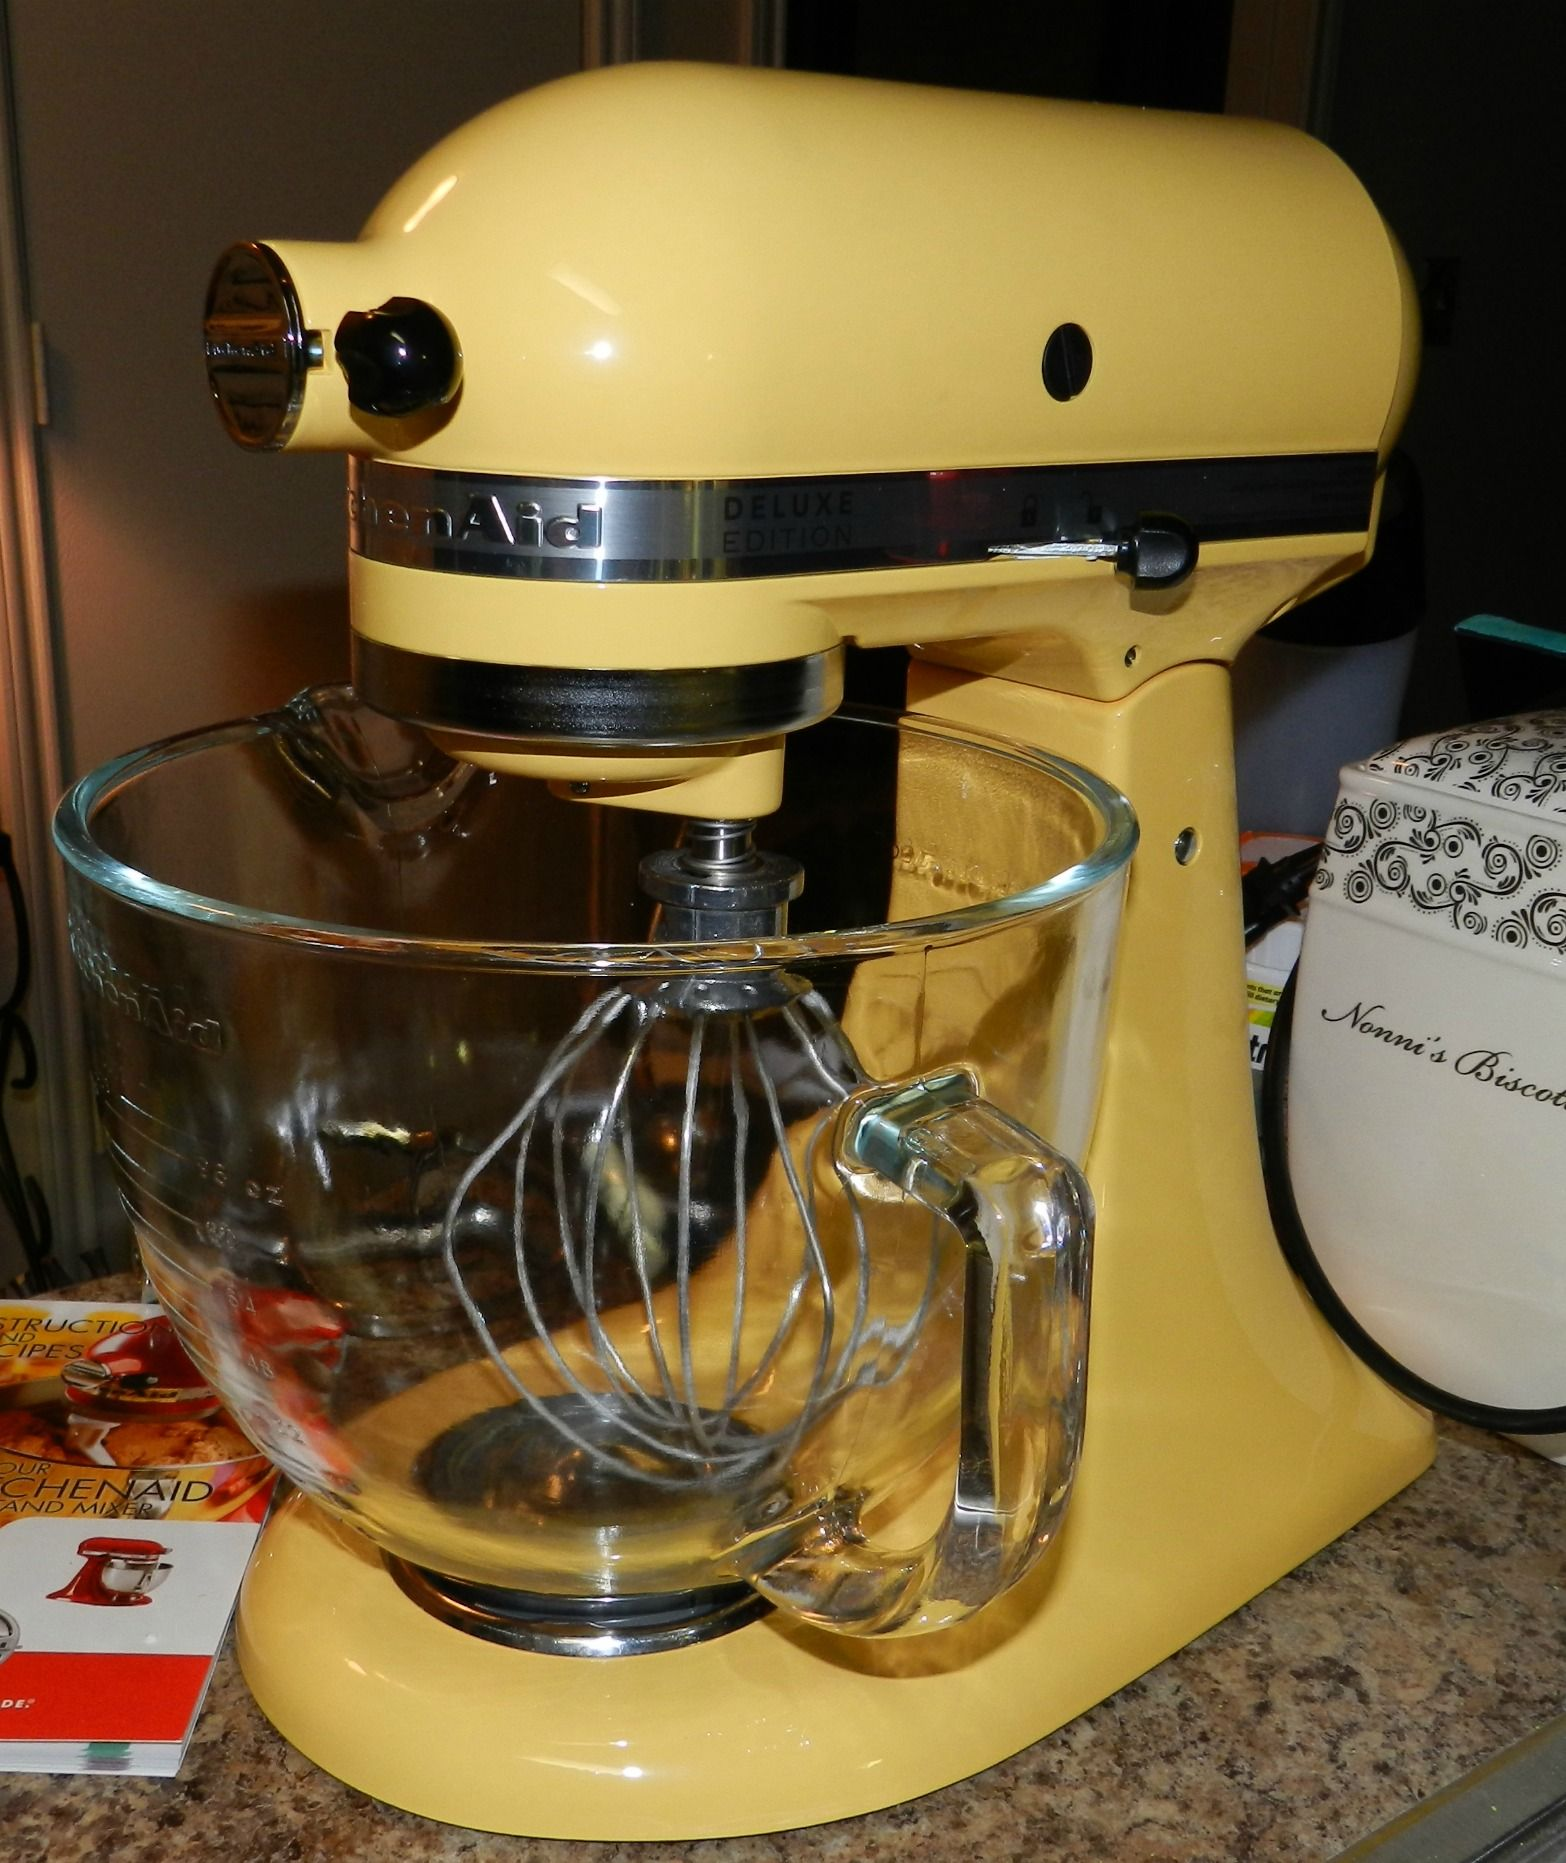 Kitchenaid mixer in buttercup :)   Love me some kitchenAid mixers ...